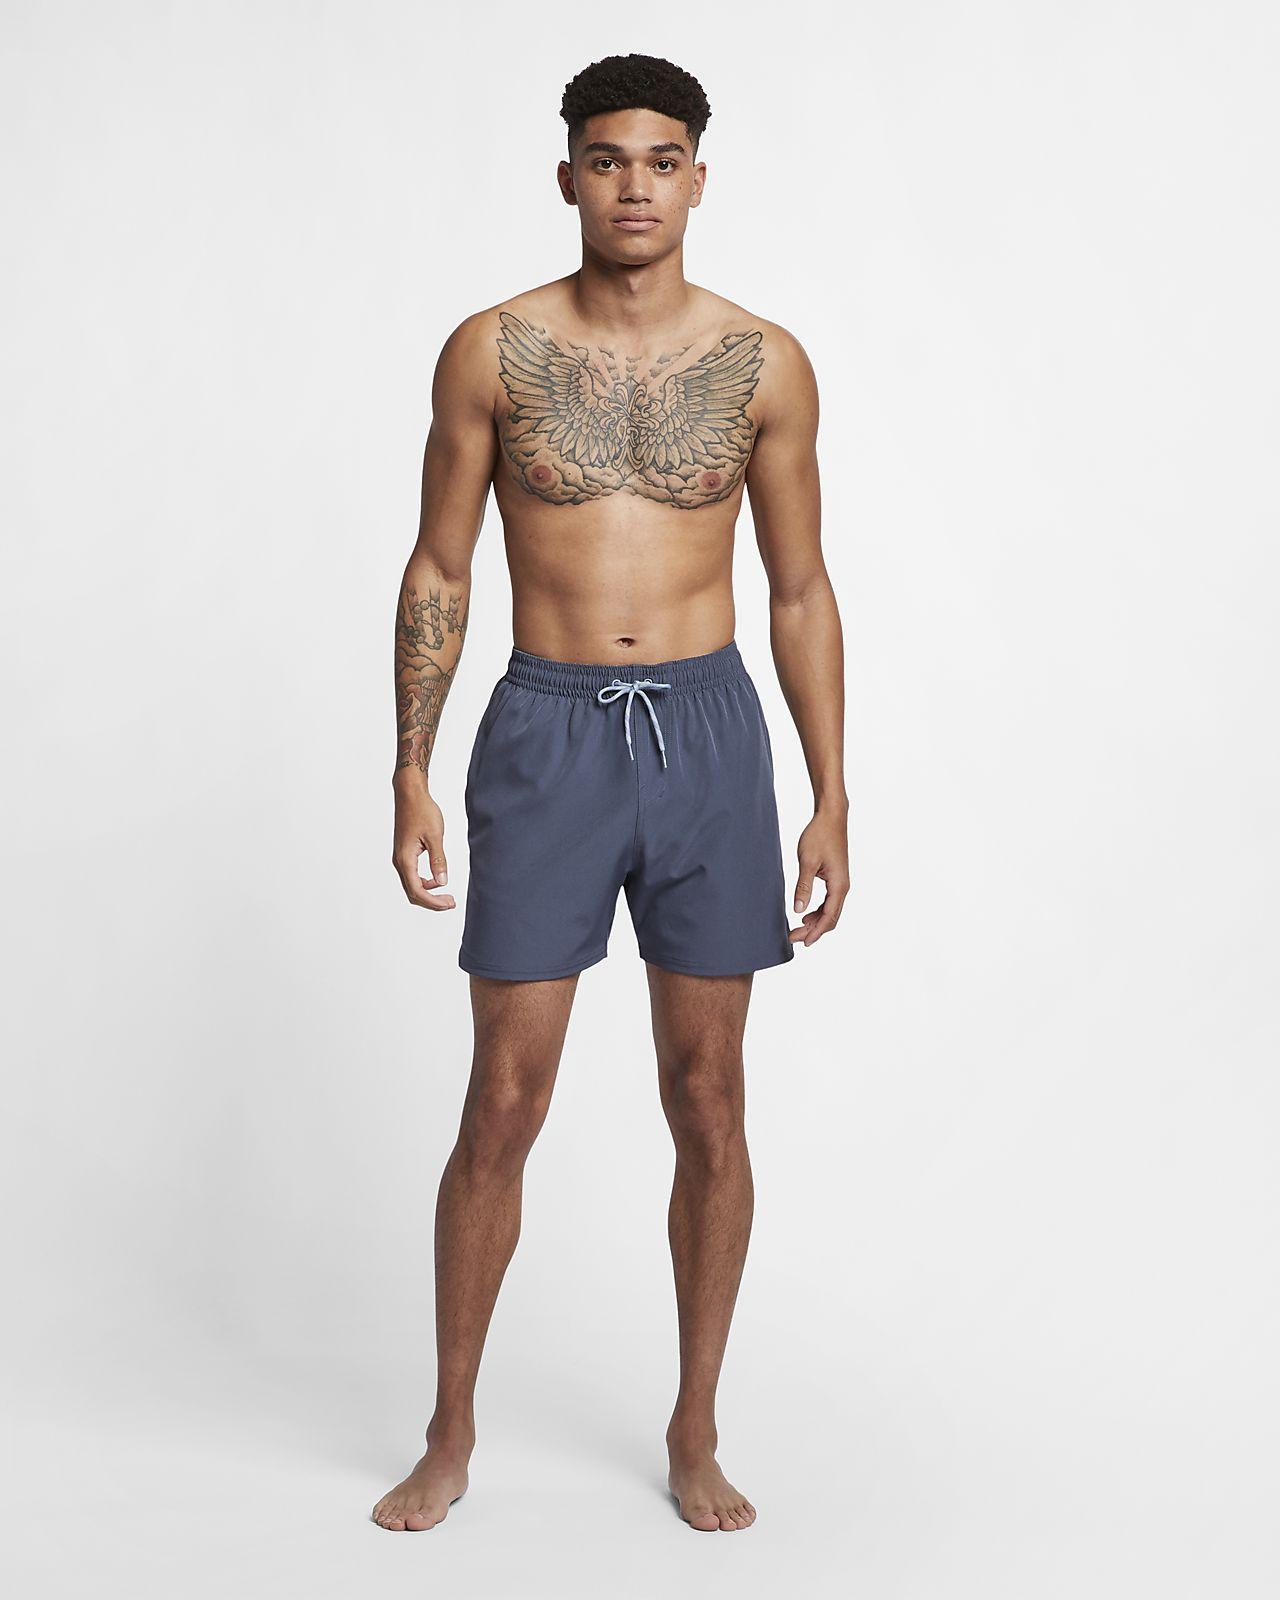 55897823f2e0 Swimming Trunks Nike Swim Retro Stripe Lap Men s 13cm (approx.) Swimming  Trunks